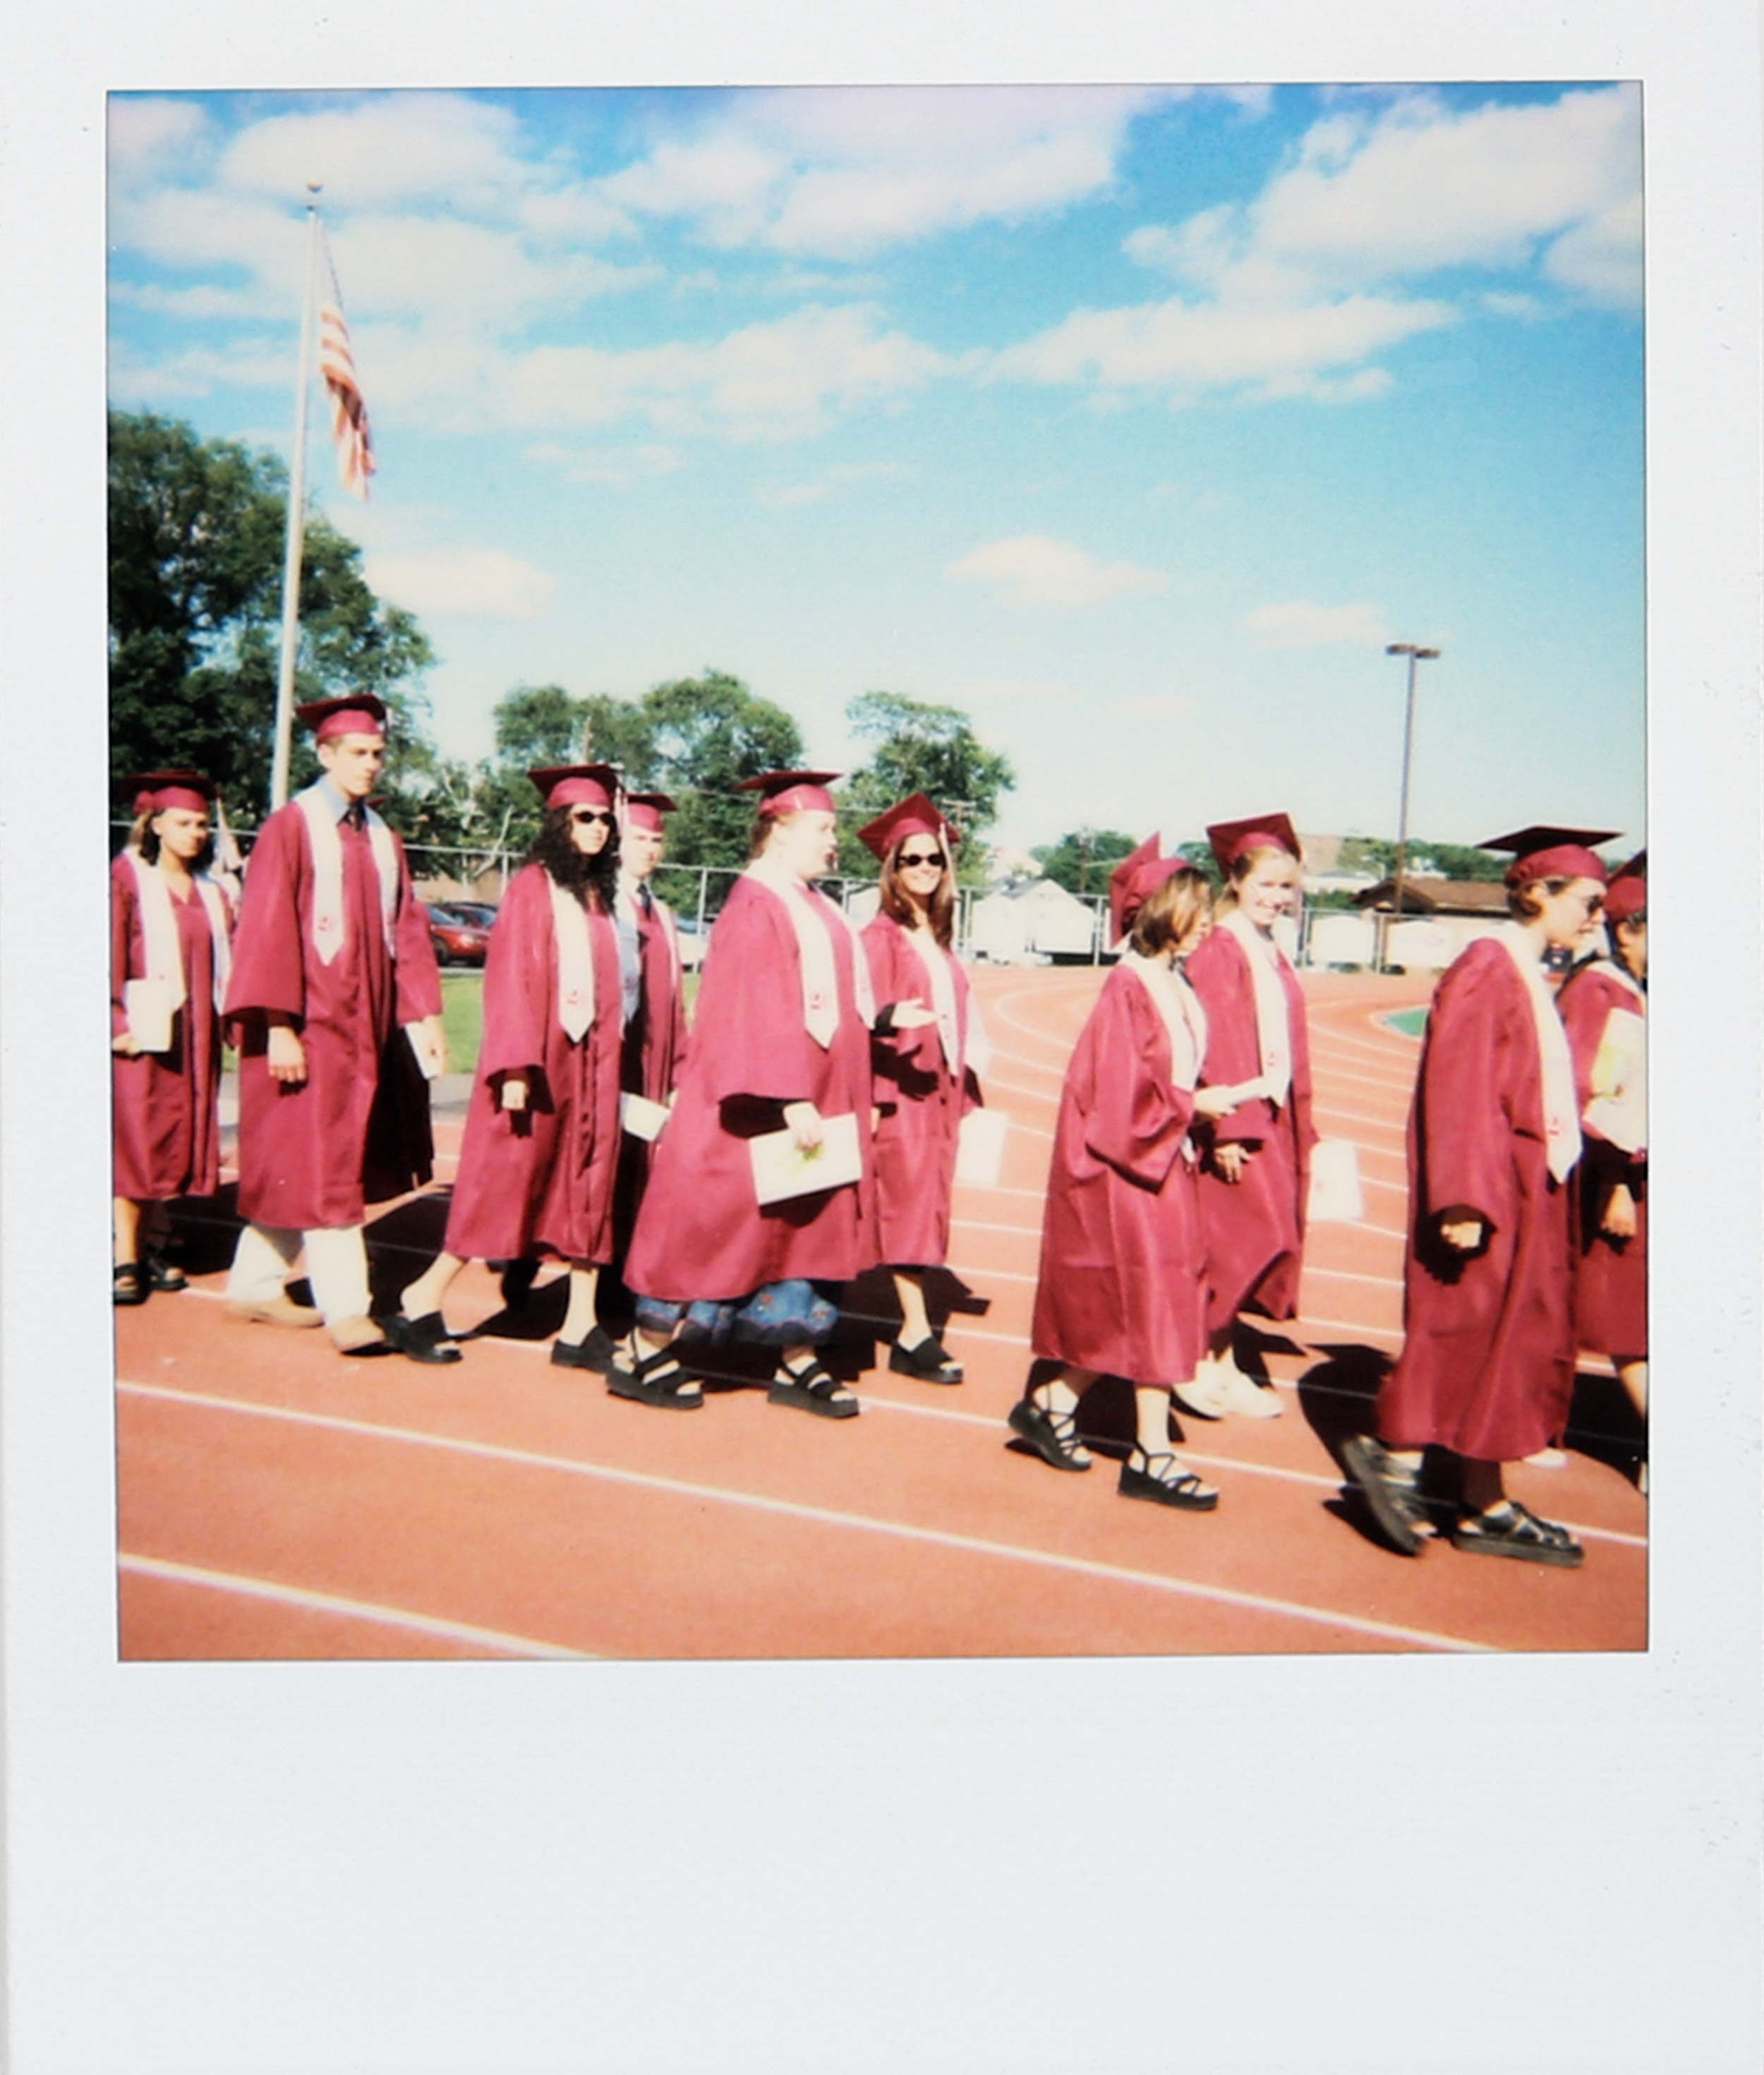 graduation-1T4A7556.jpg